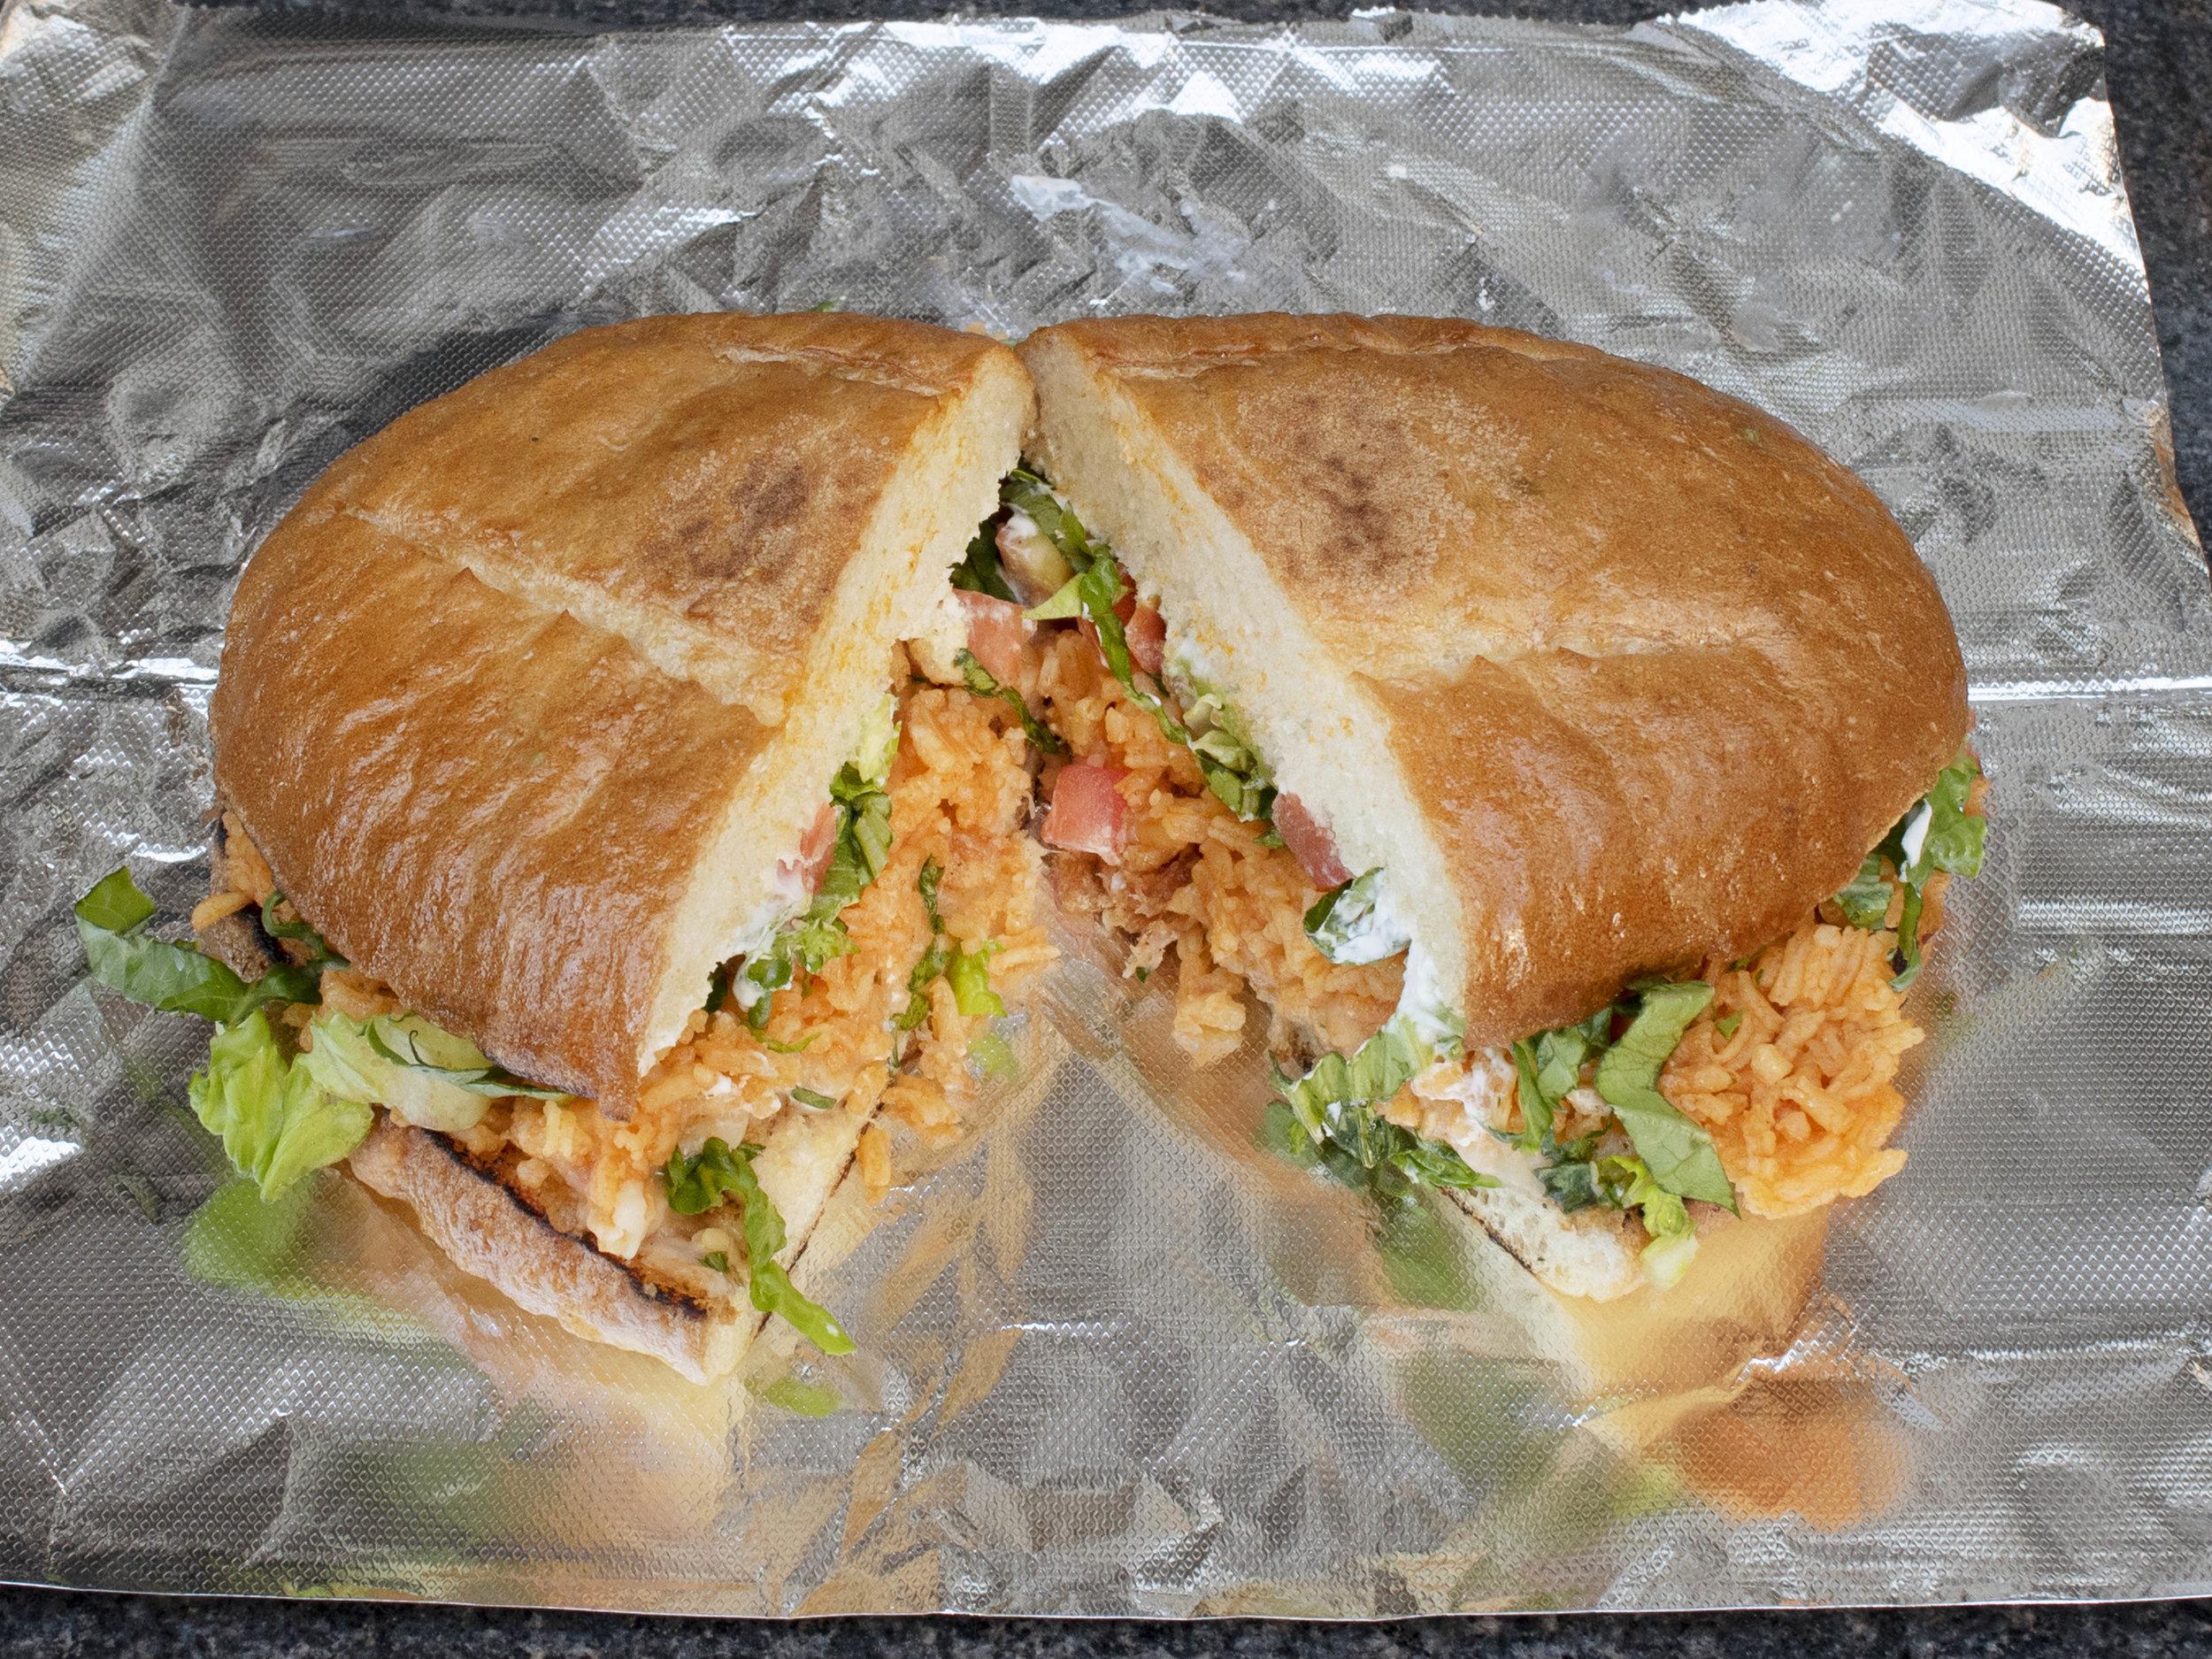 Aztec Daves Food Truck_veggie torta 2_option1.jpg